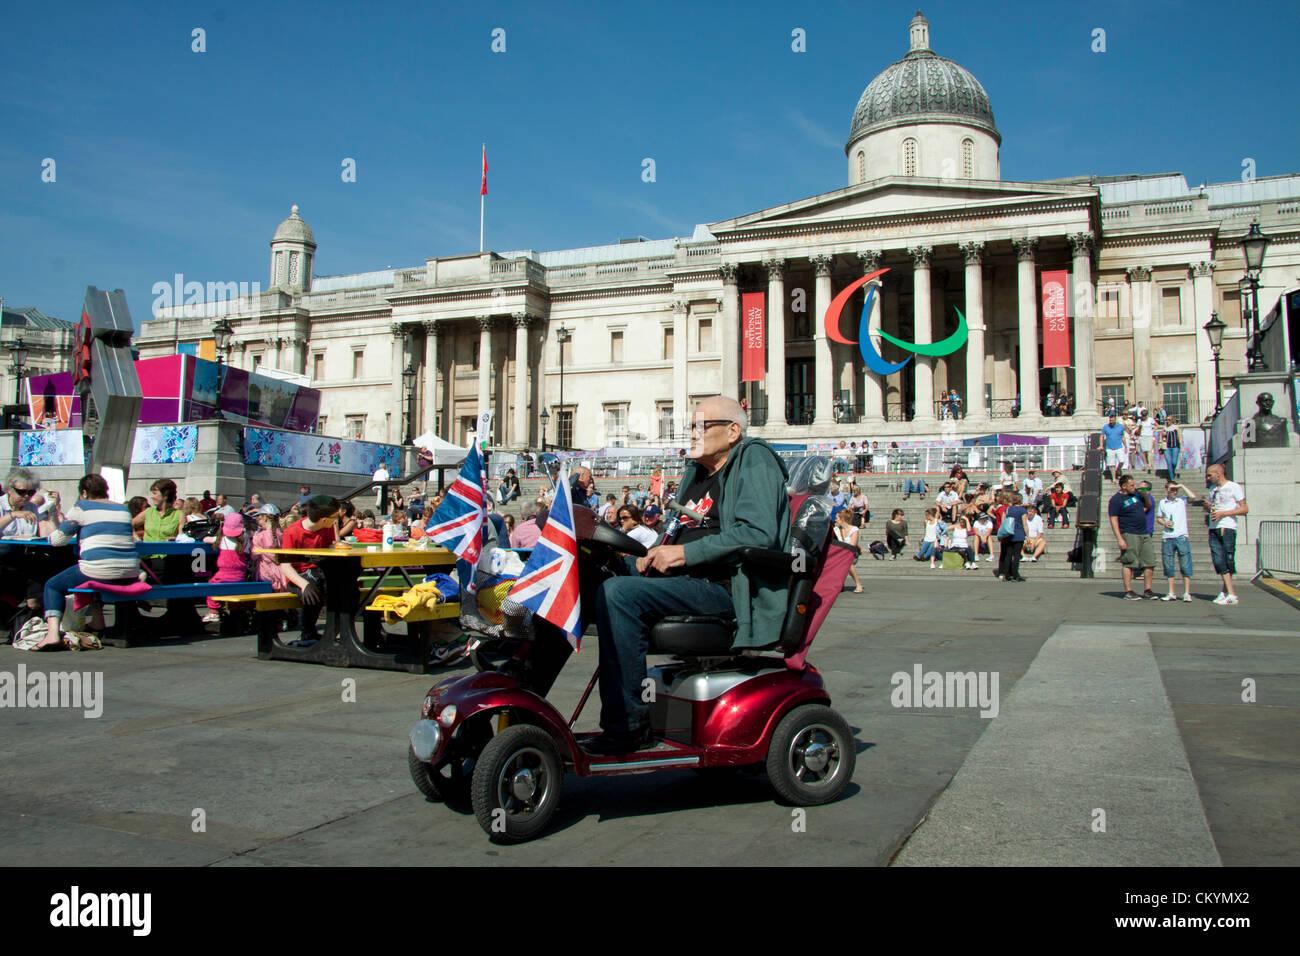 Londra, UK, Lunedì 23 Luglio, 2012. LOmega orologio su